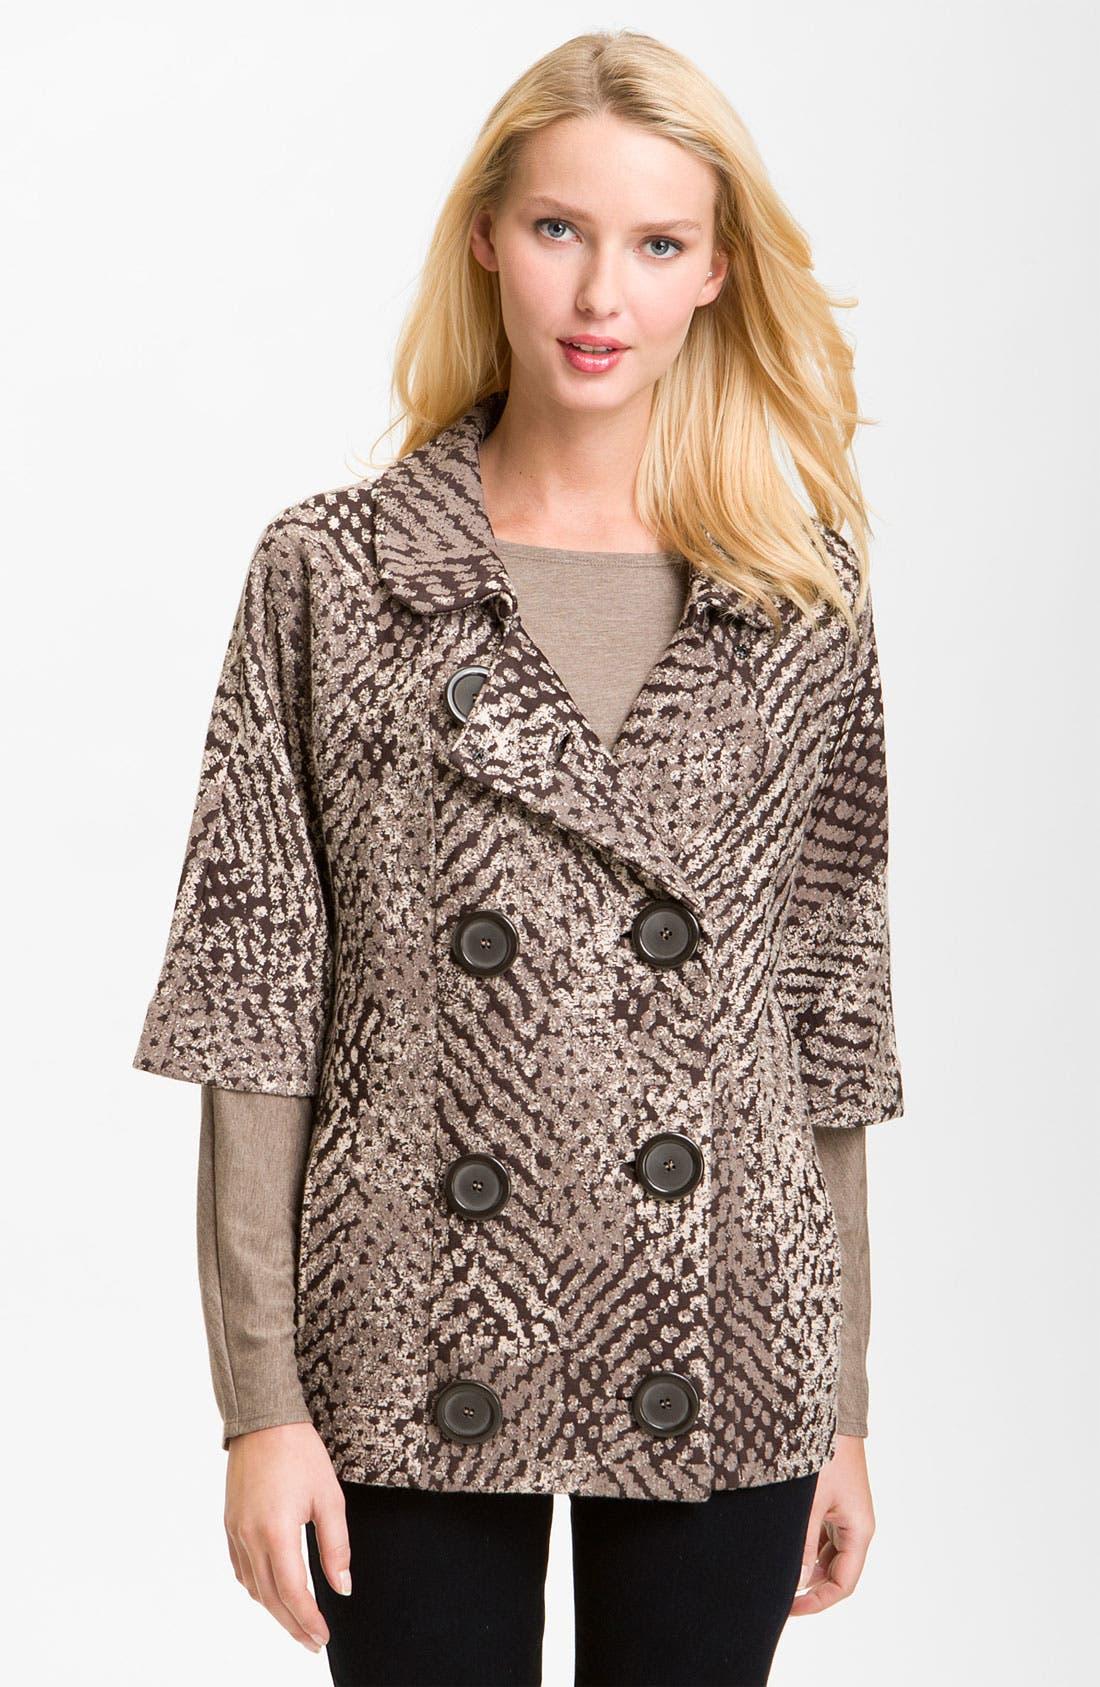 Alternate Image 1 Selected - Nic + Zoe 'Textured Dots' Knit Jacket (Petite)